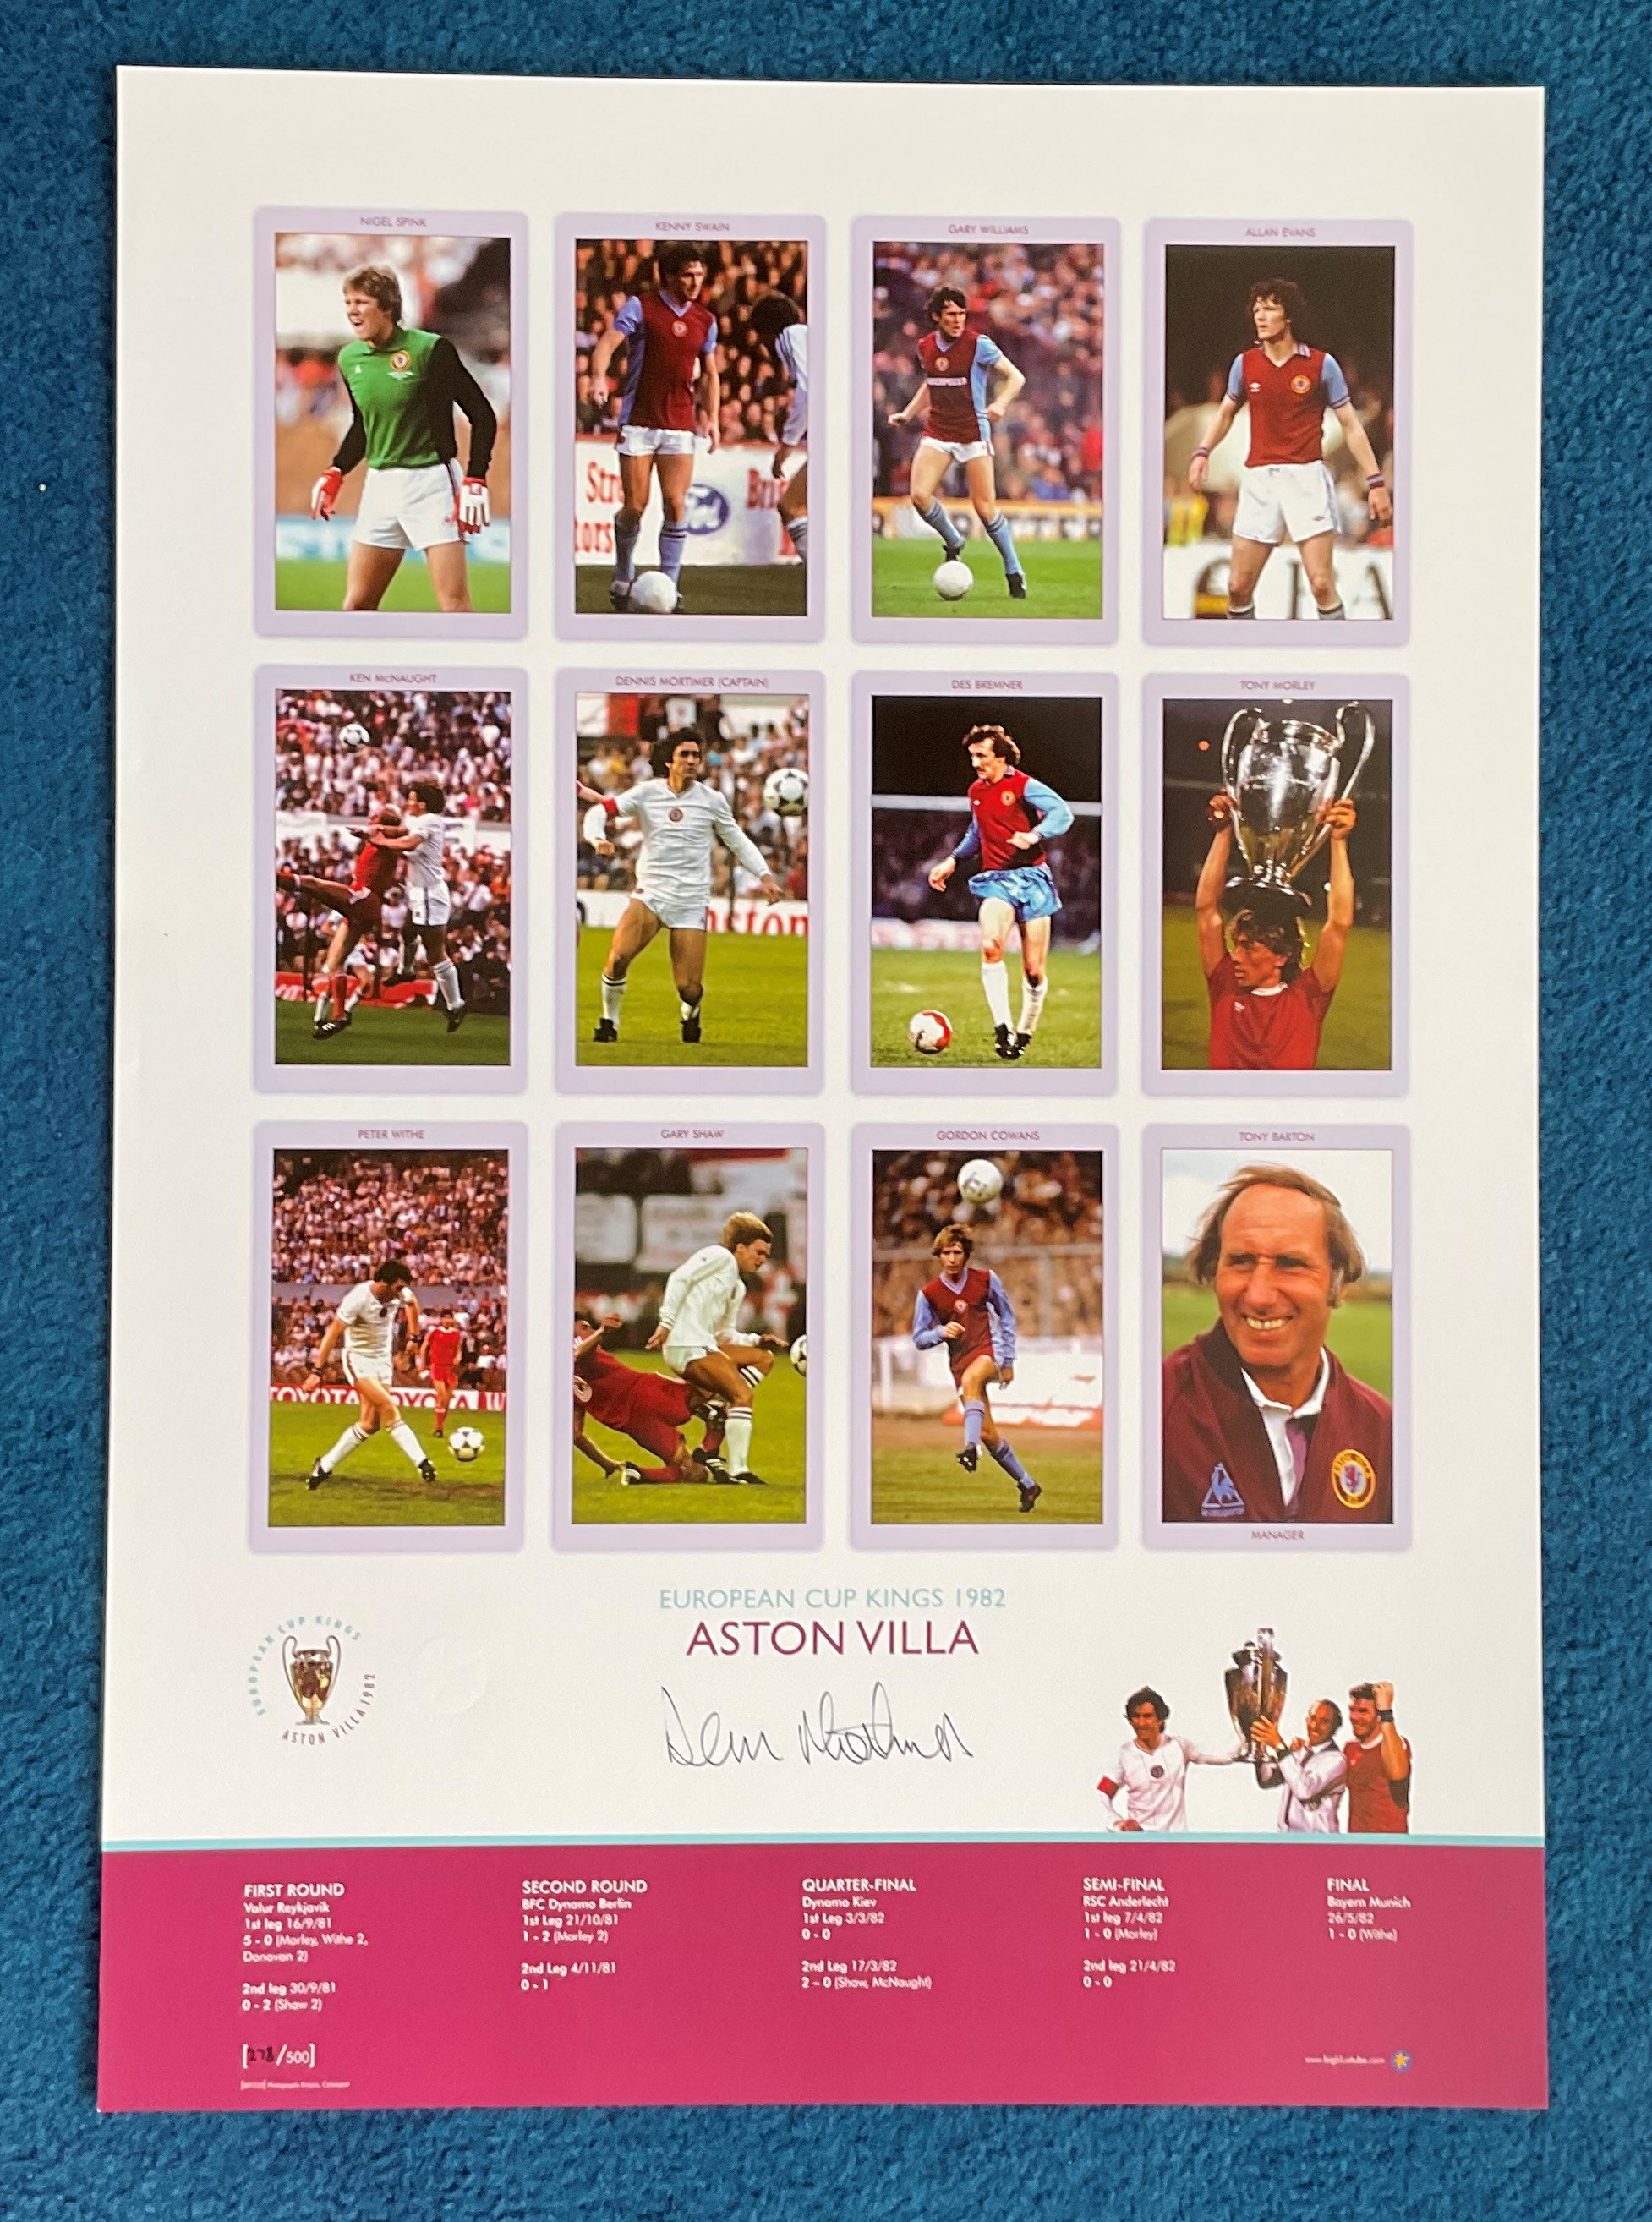 Dennis Mortimer signed 22x16 European Cup Kings 1982 Aston Villa Big Blue Tube print. Limited